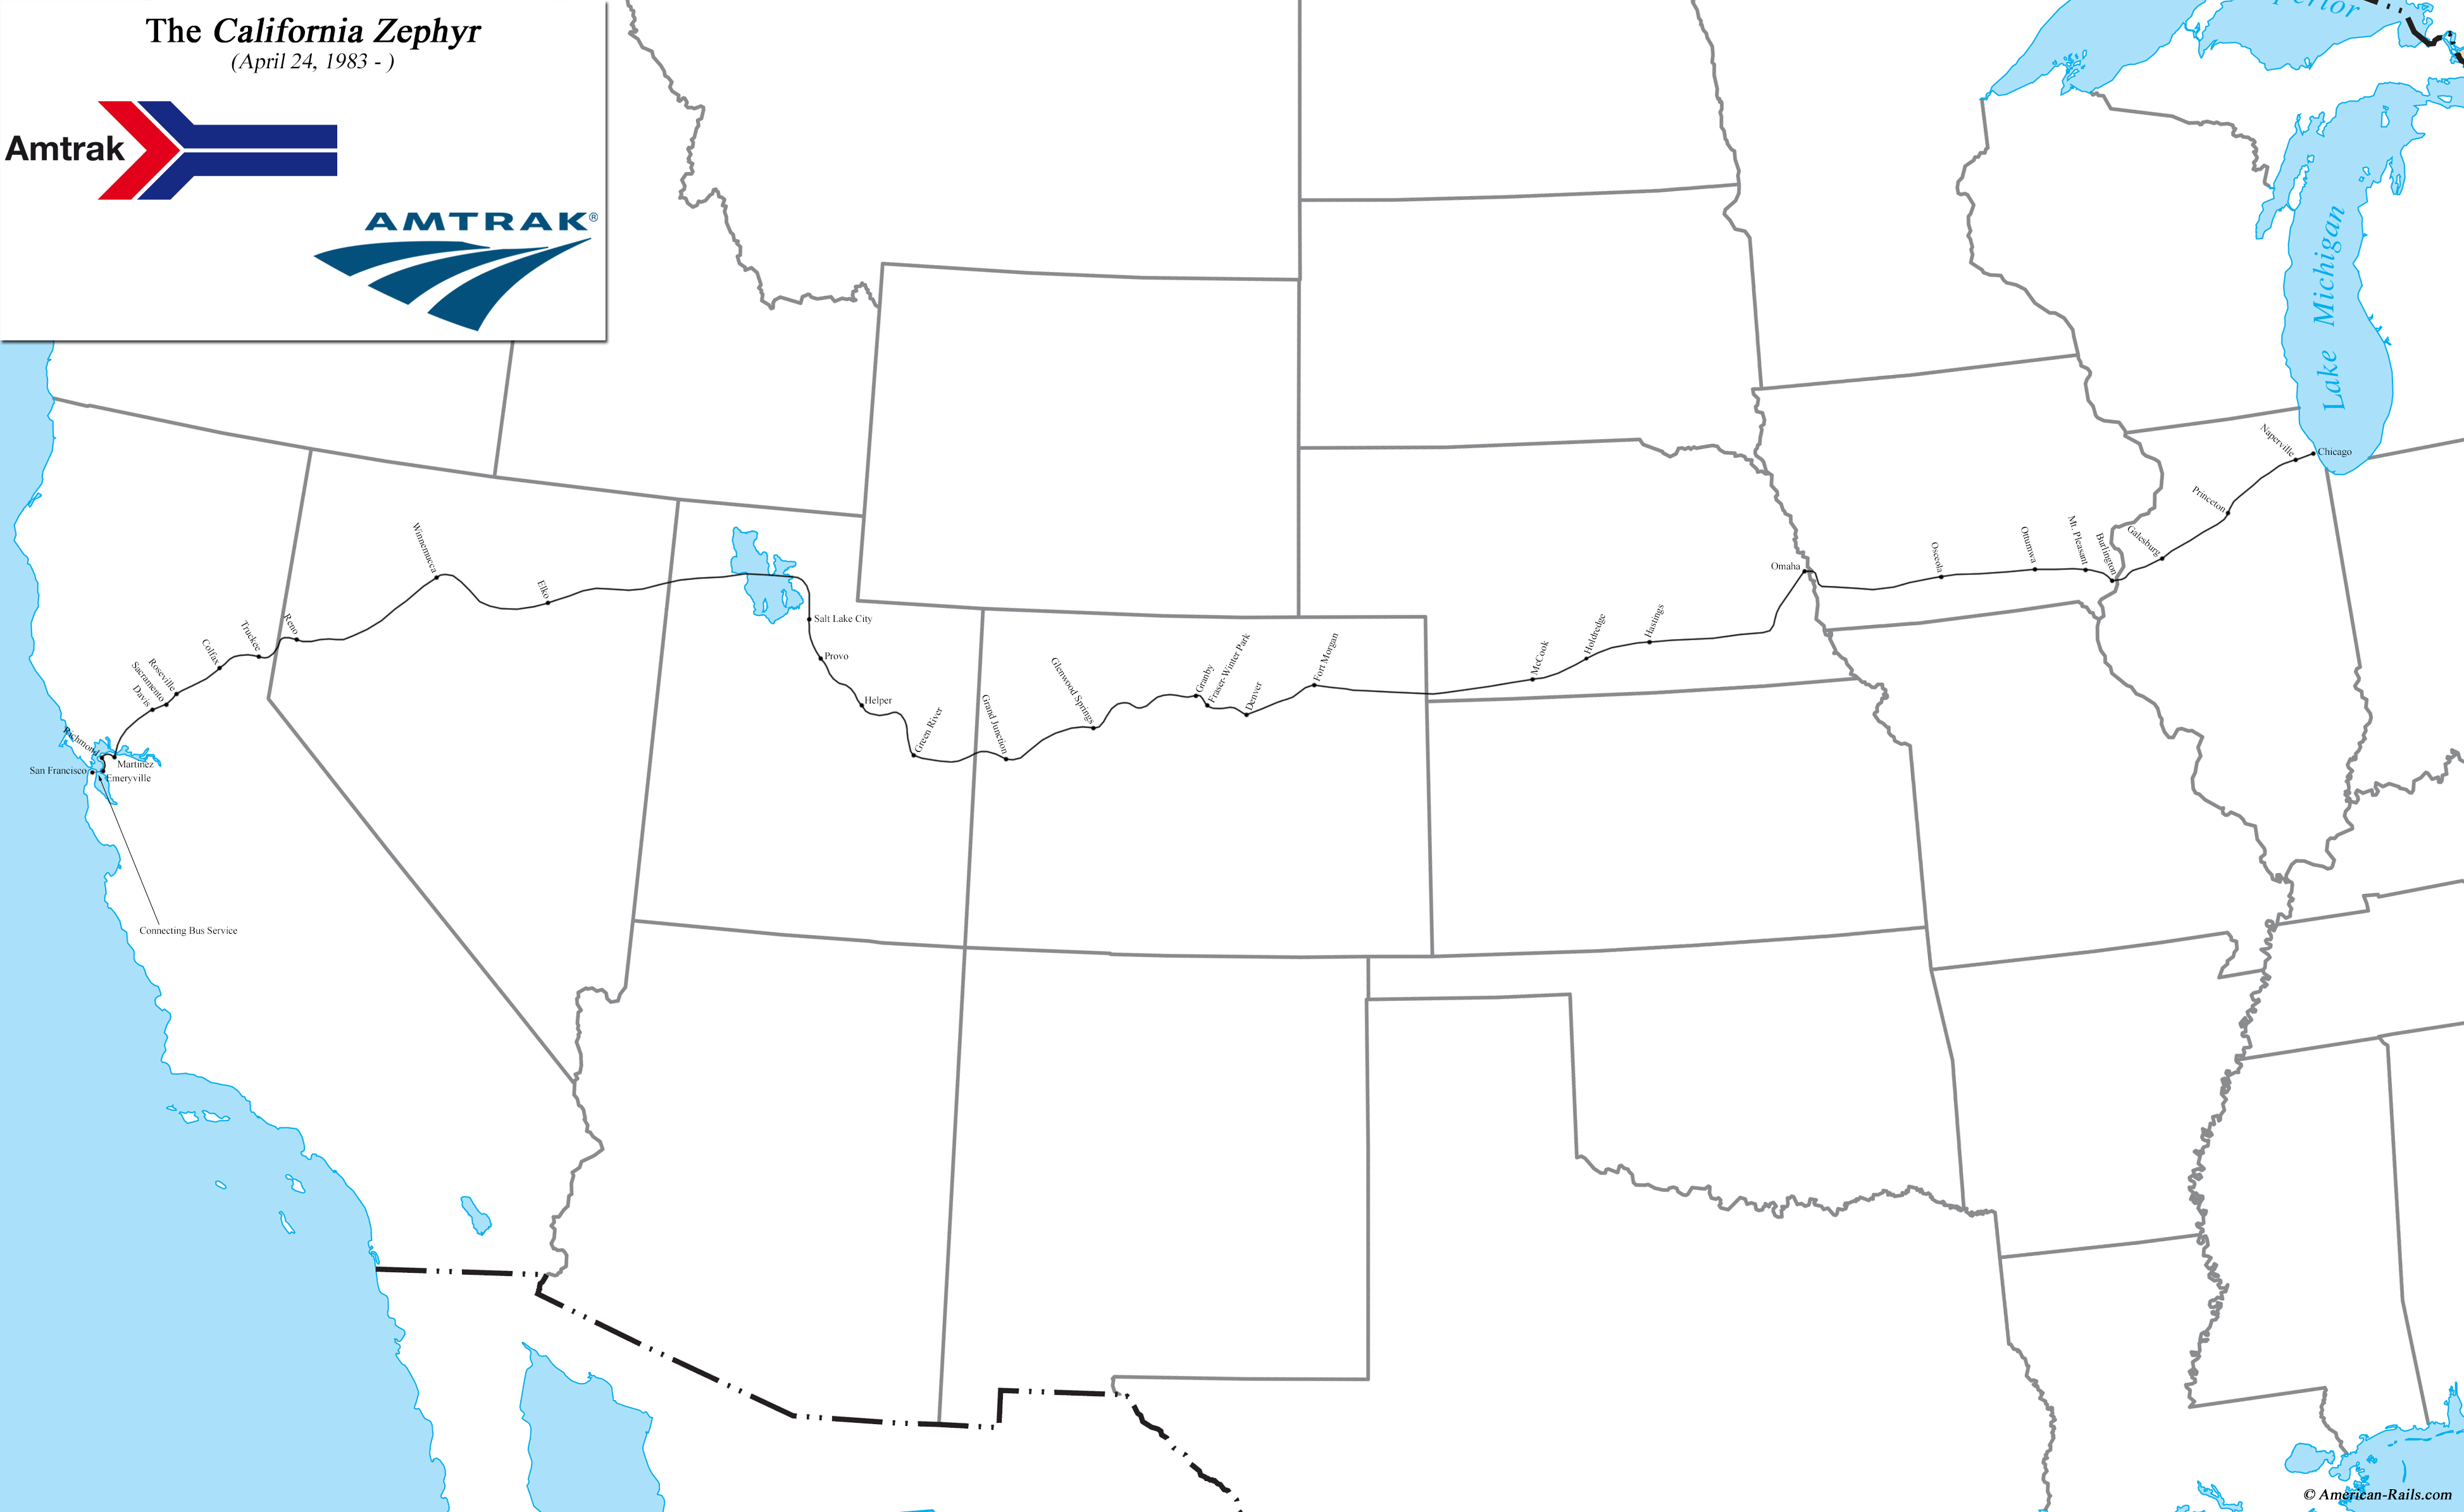 Map Of California Zephyr Route.California Zephyr